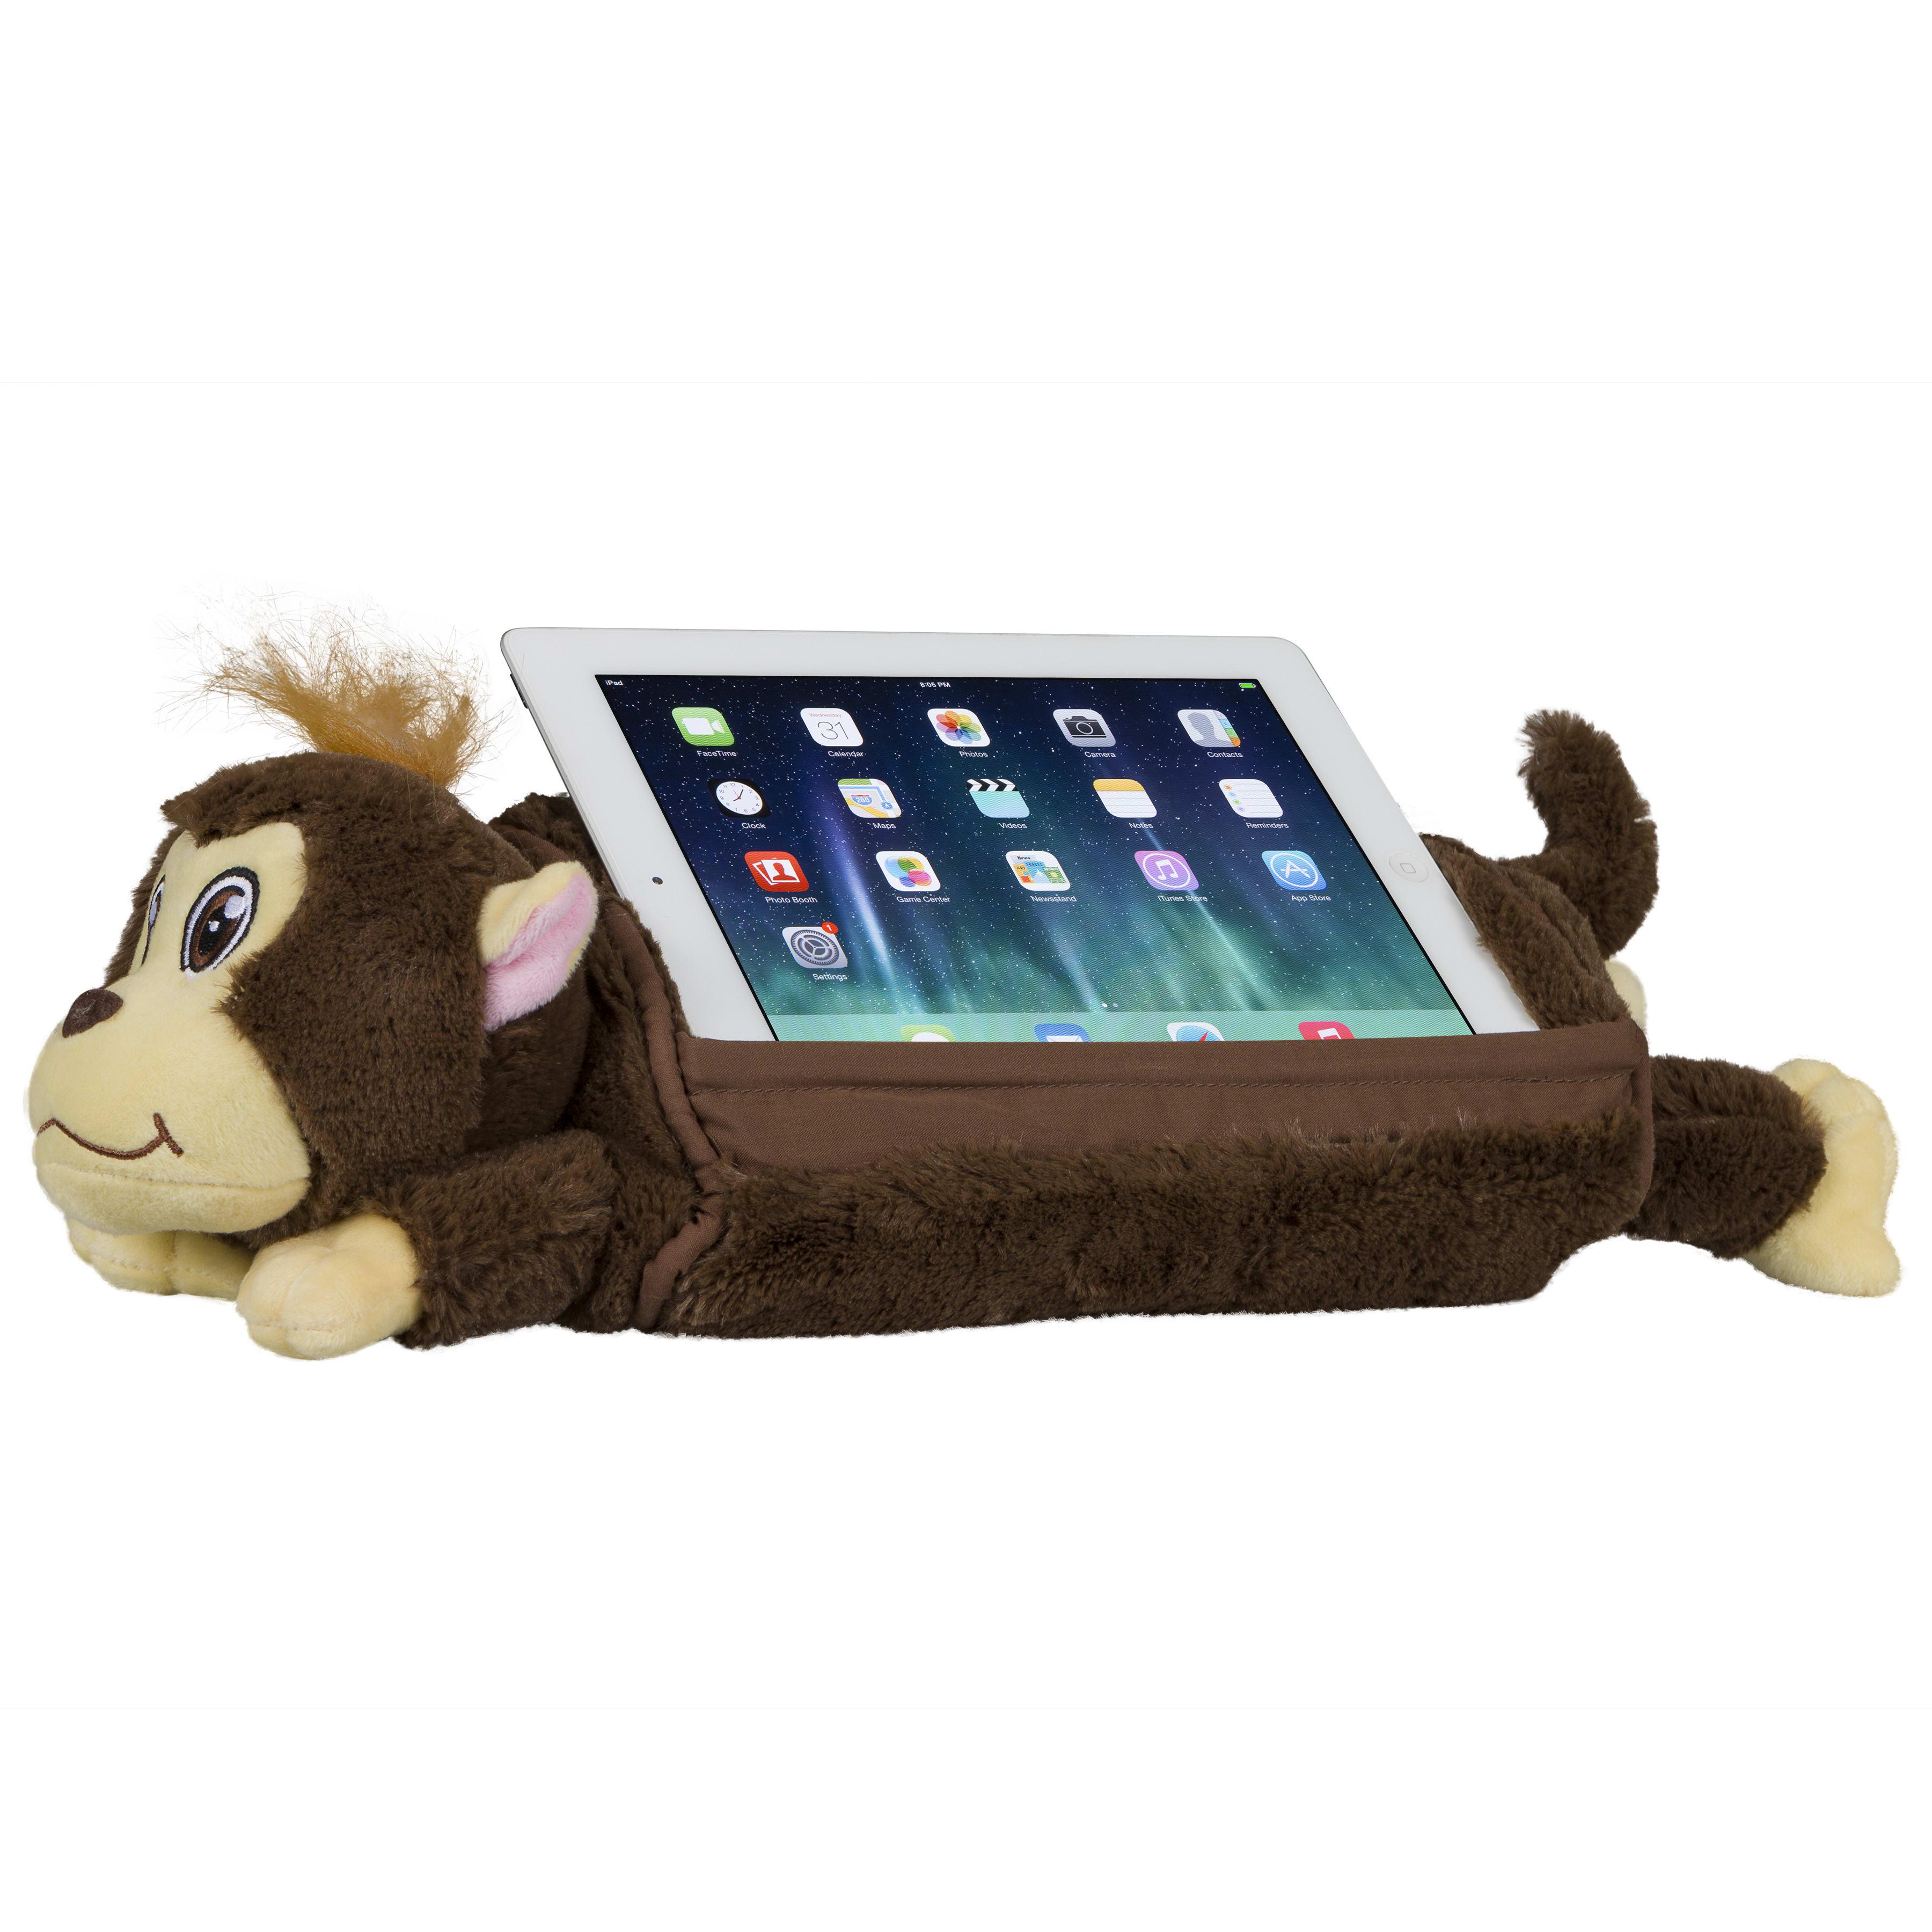 "LapGear Lap Pets Tablet Pillow, 19-1/2"" x 6-7/8"", Monkey"